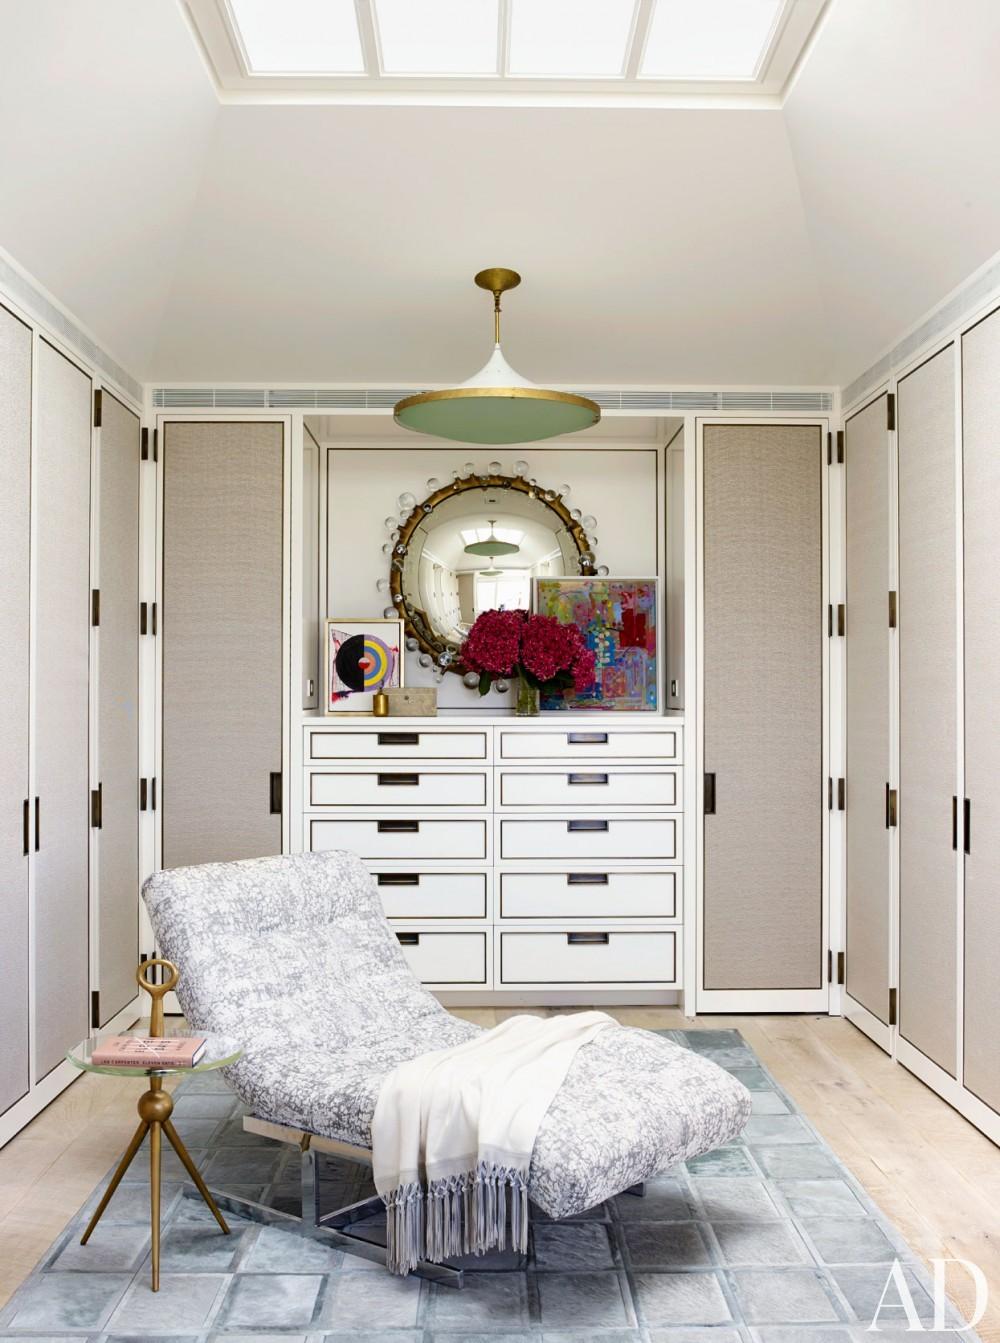 Beach Dressing Room/Closet by Cullman & Cravis and Ike Kligerman Barkley in Sagaponack, NY